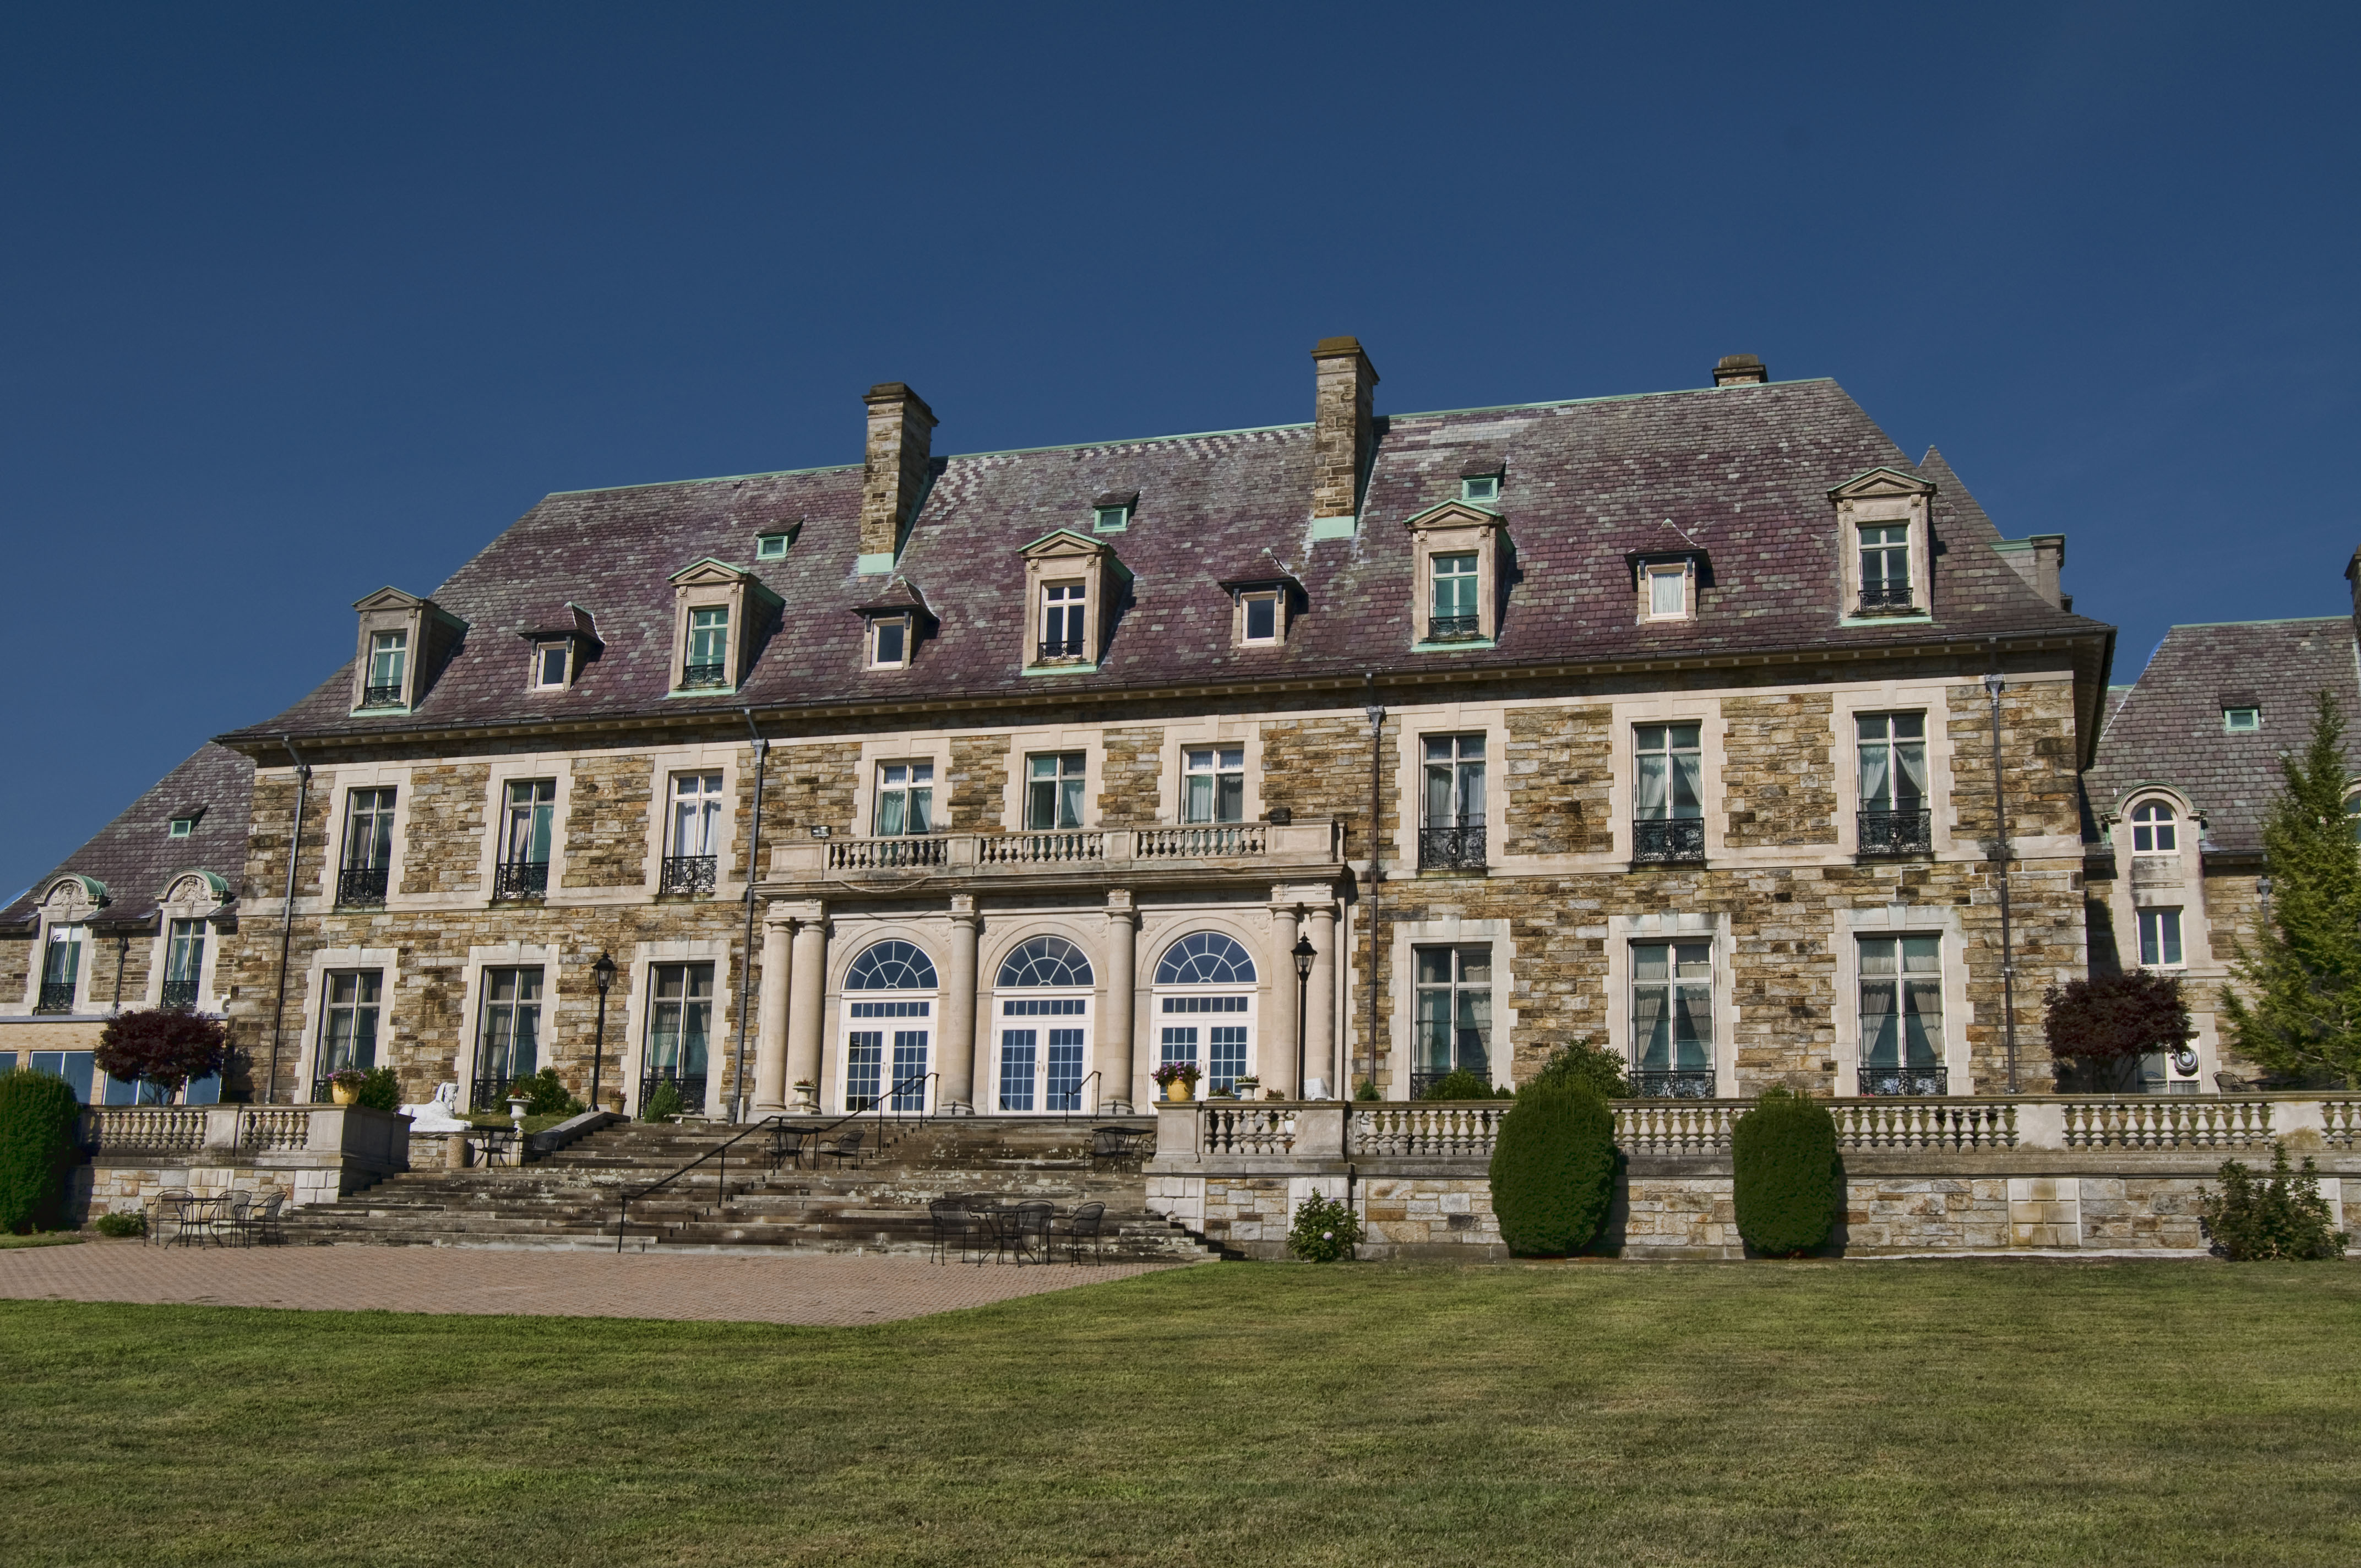 filealdrich mansion indian oaks 16 finishedjpg